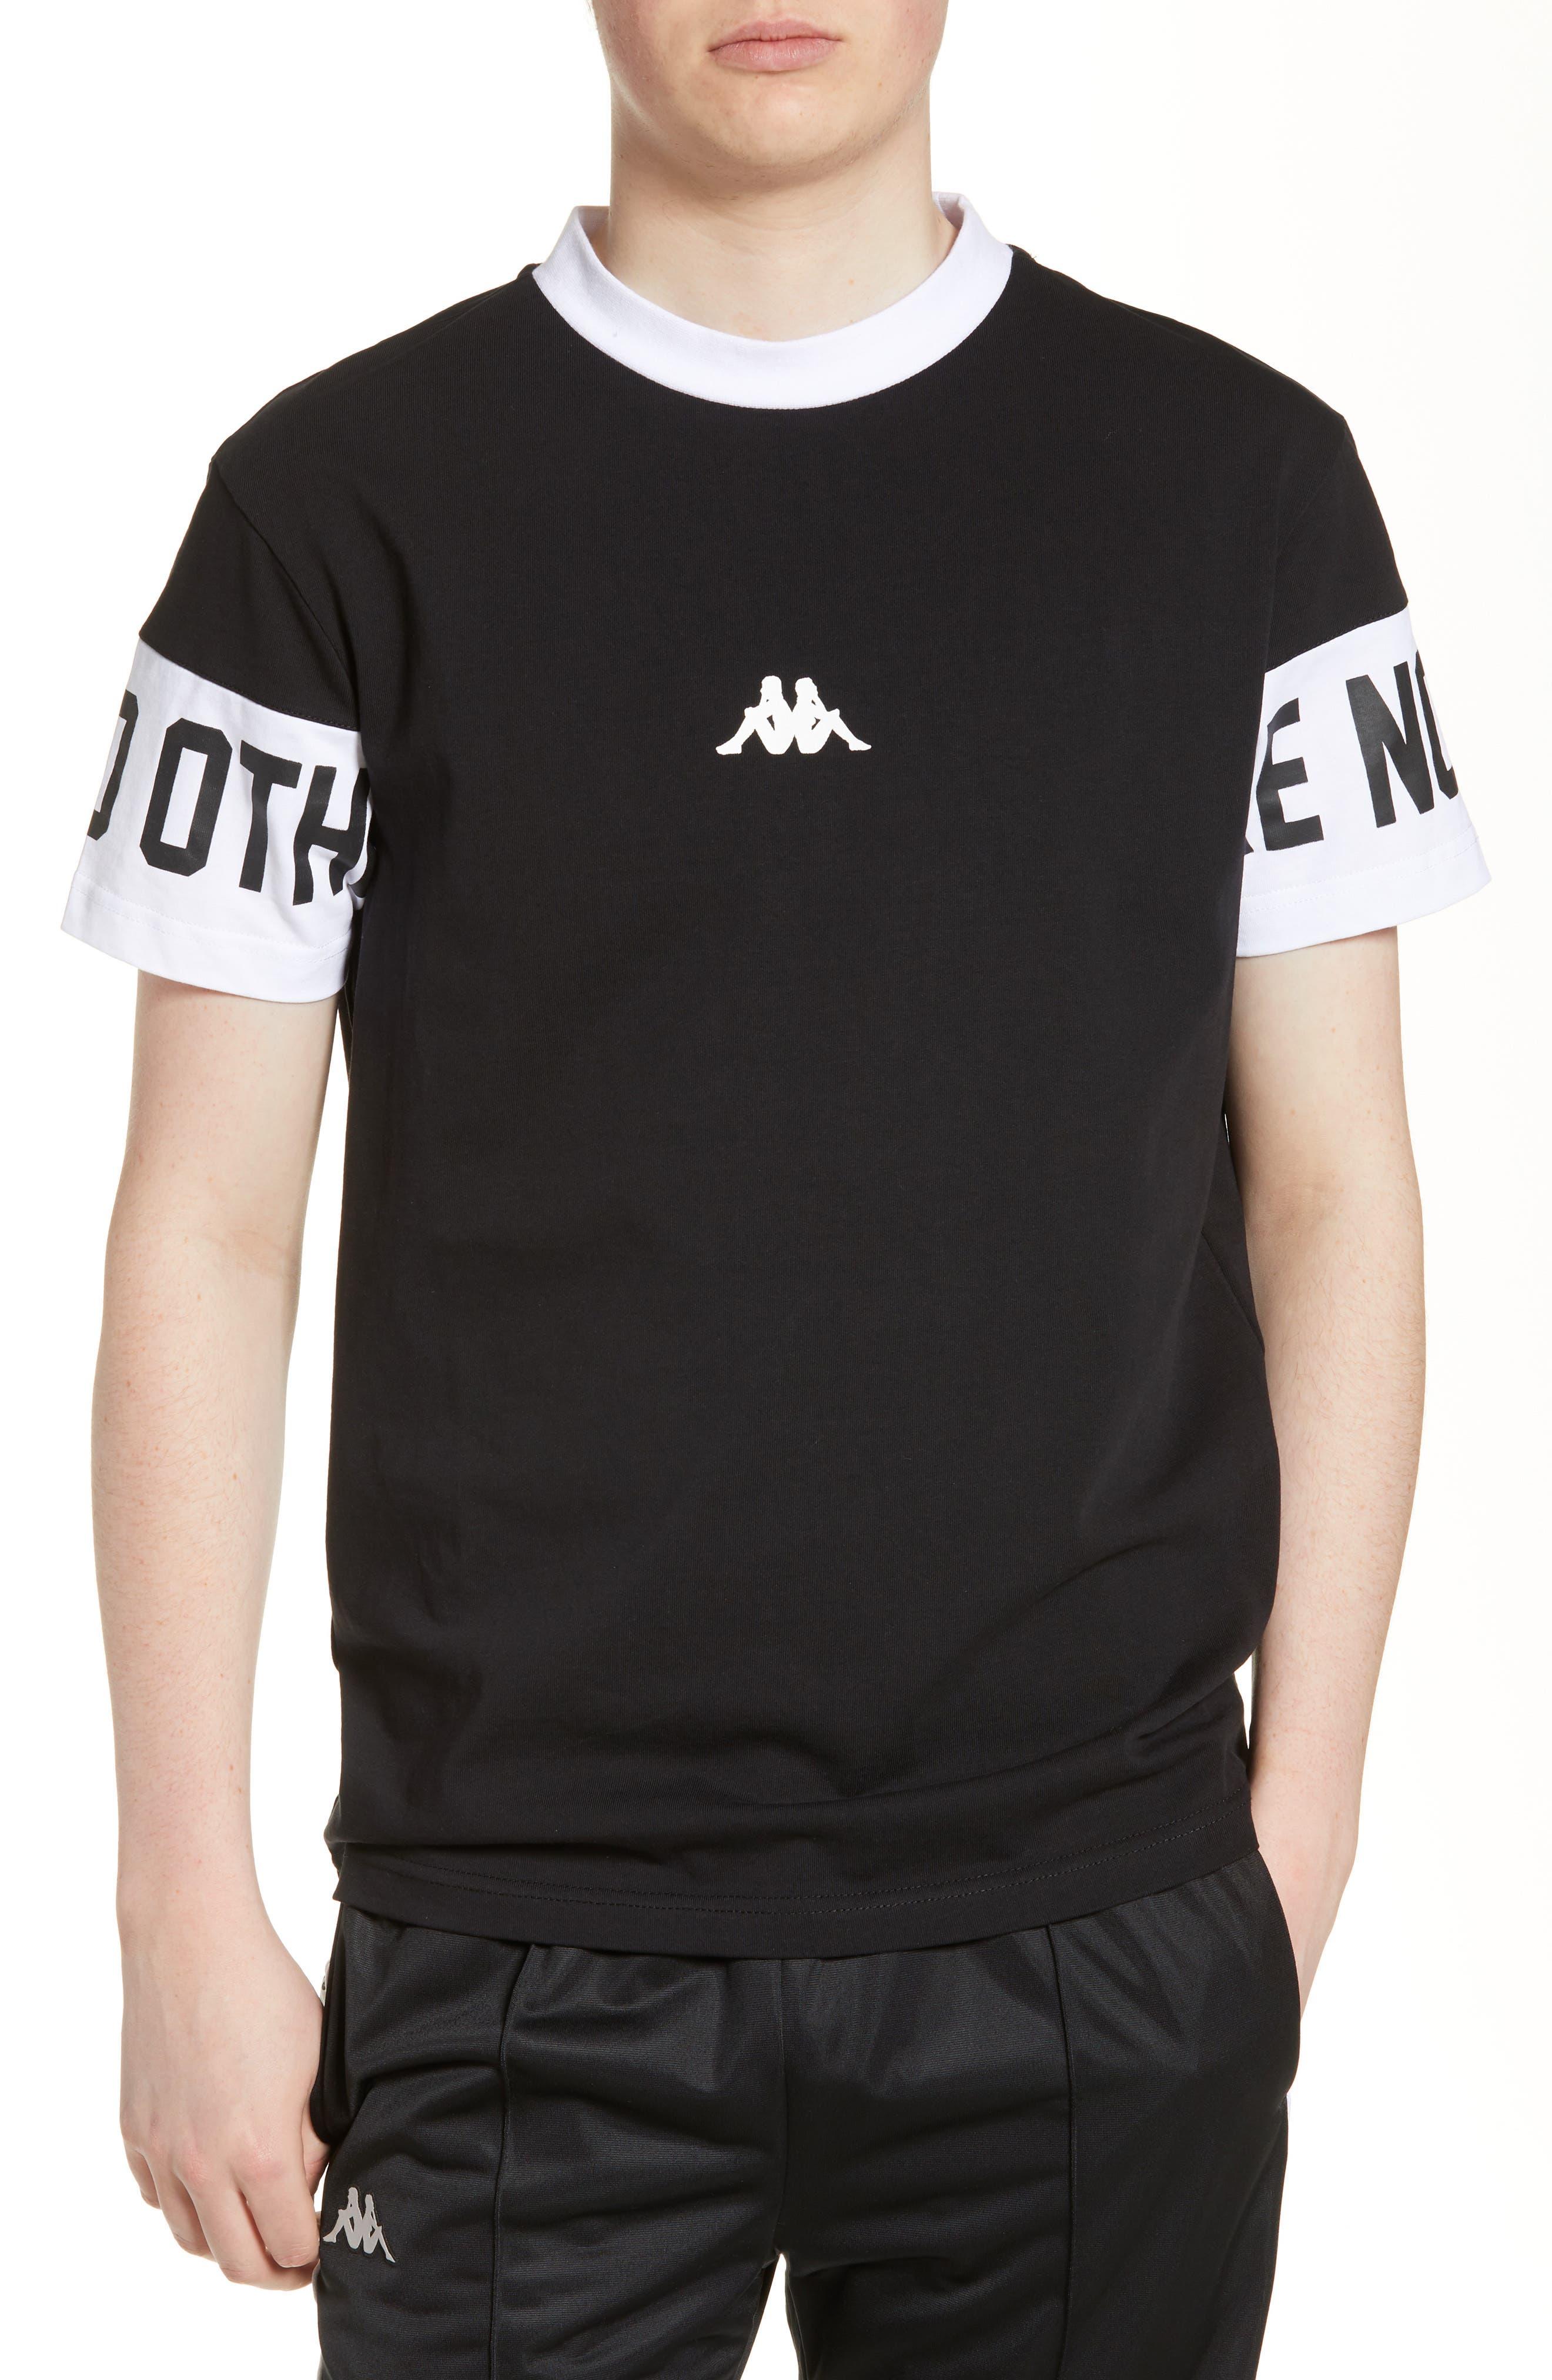 Kappa Authentic Baltos T-Shirt, Black